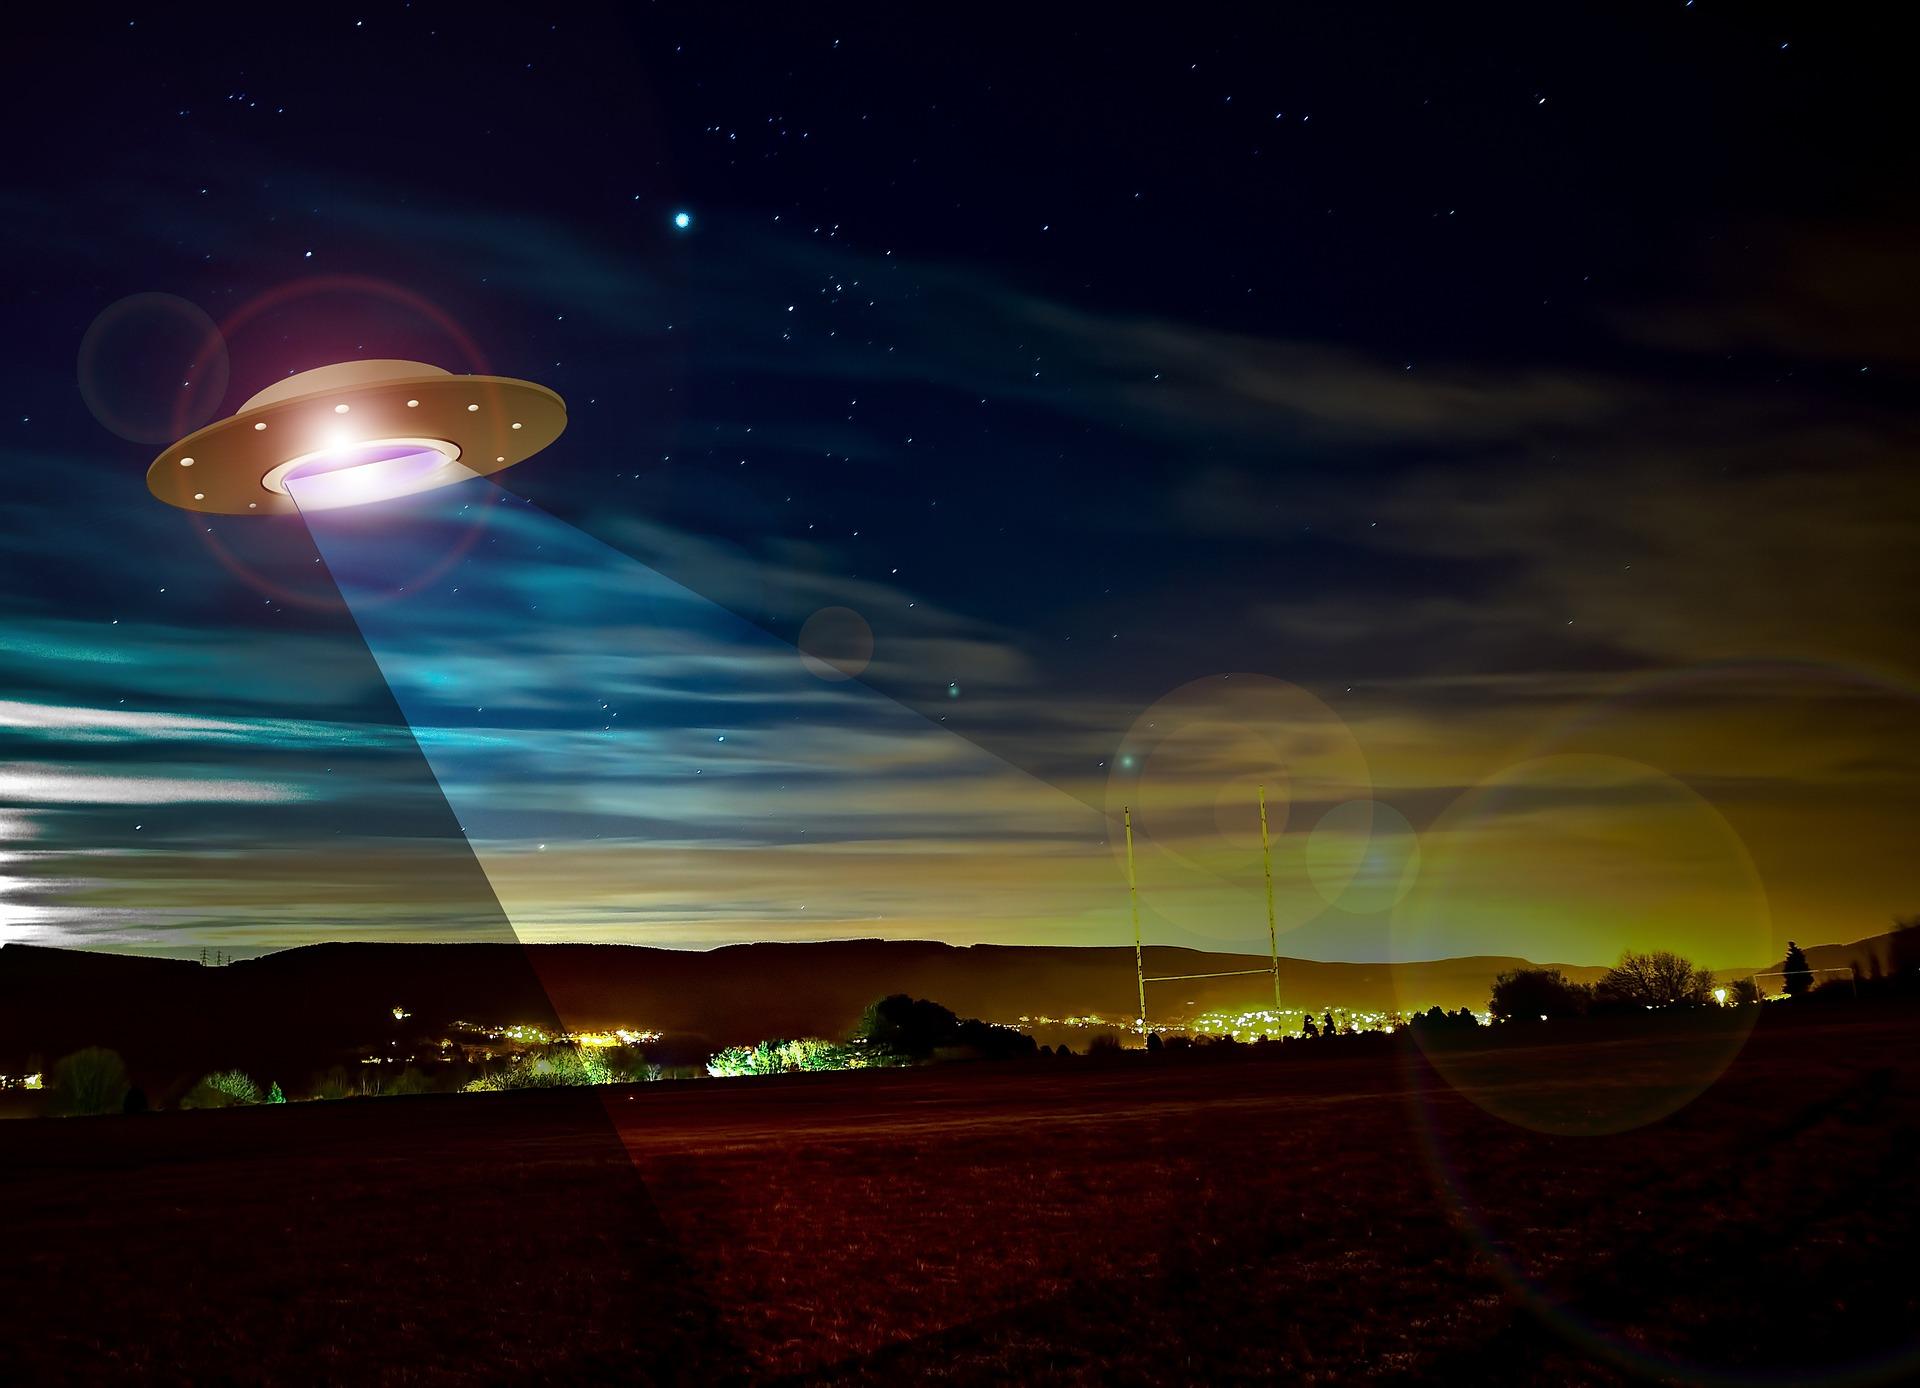 ufo-782655_1920